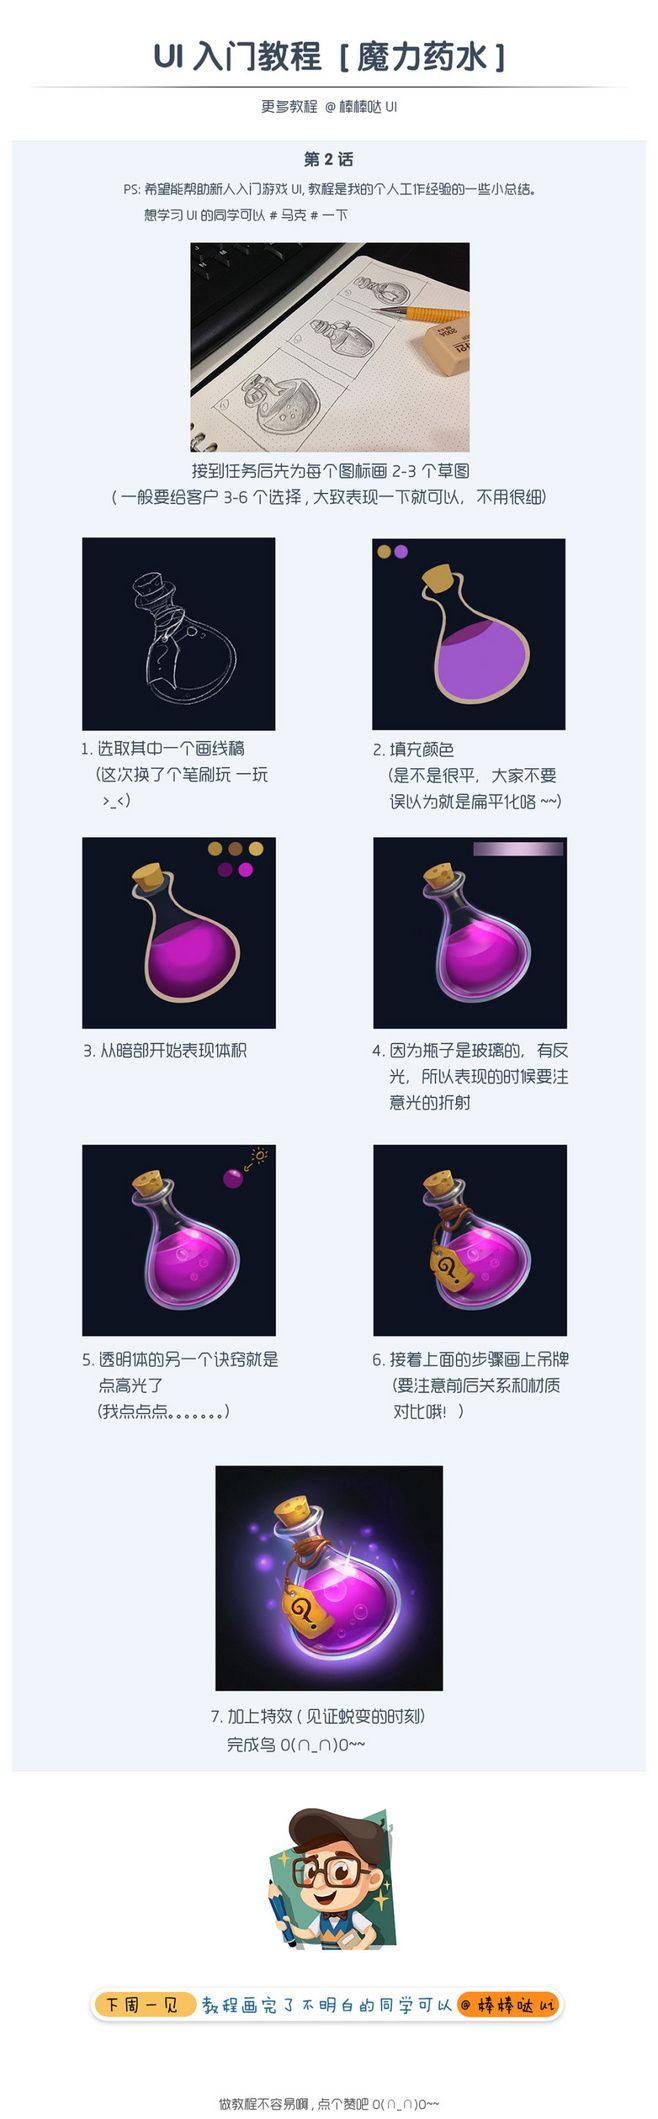 原创作品:游戏UI入门教程_魔力药水(透...★ Find more at http://www.pinterest.com/competing/